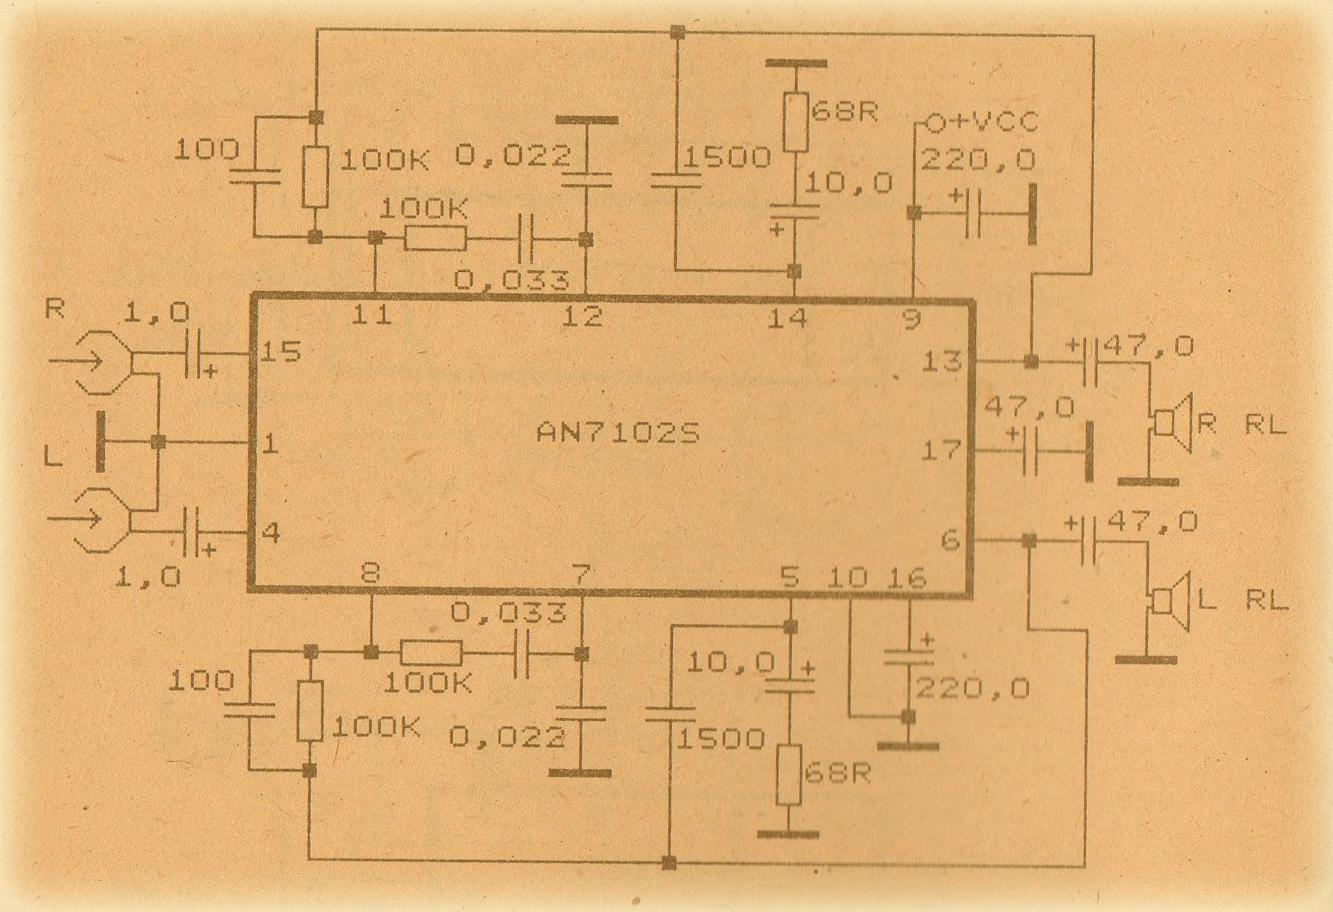 Schematic Audio Amplifer With Ic An315 Wiring Diagrams Surroundaudioamplifiercircuitdiagramjpg Power Amplifier Circuit Anxxxx Collection Electronic Rh Elcircuit Com